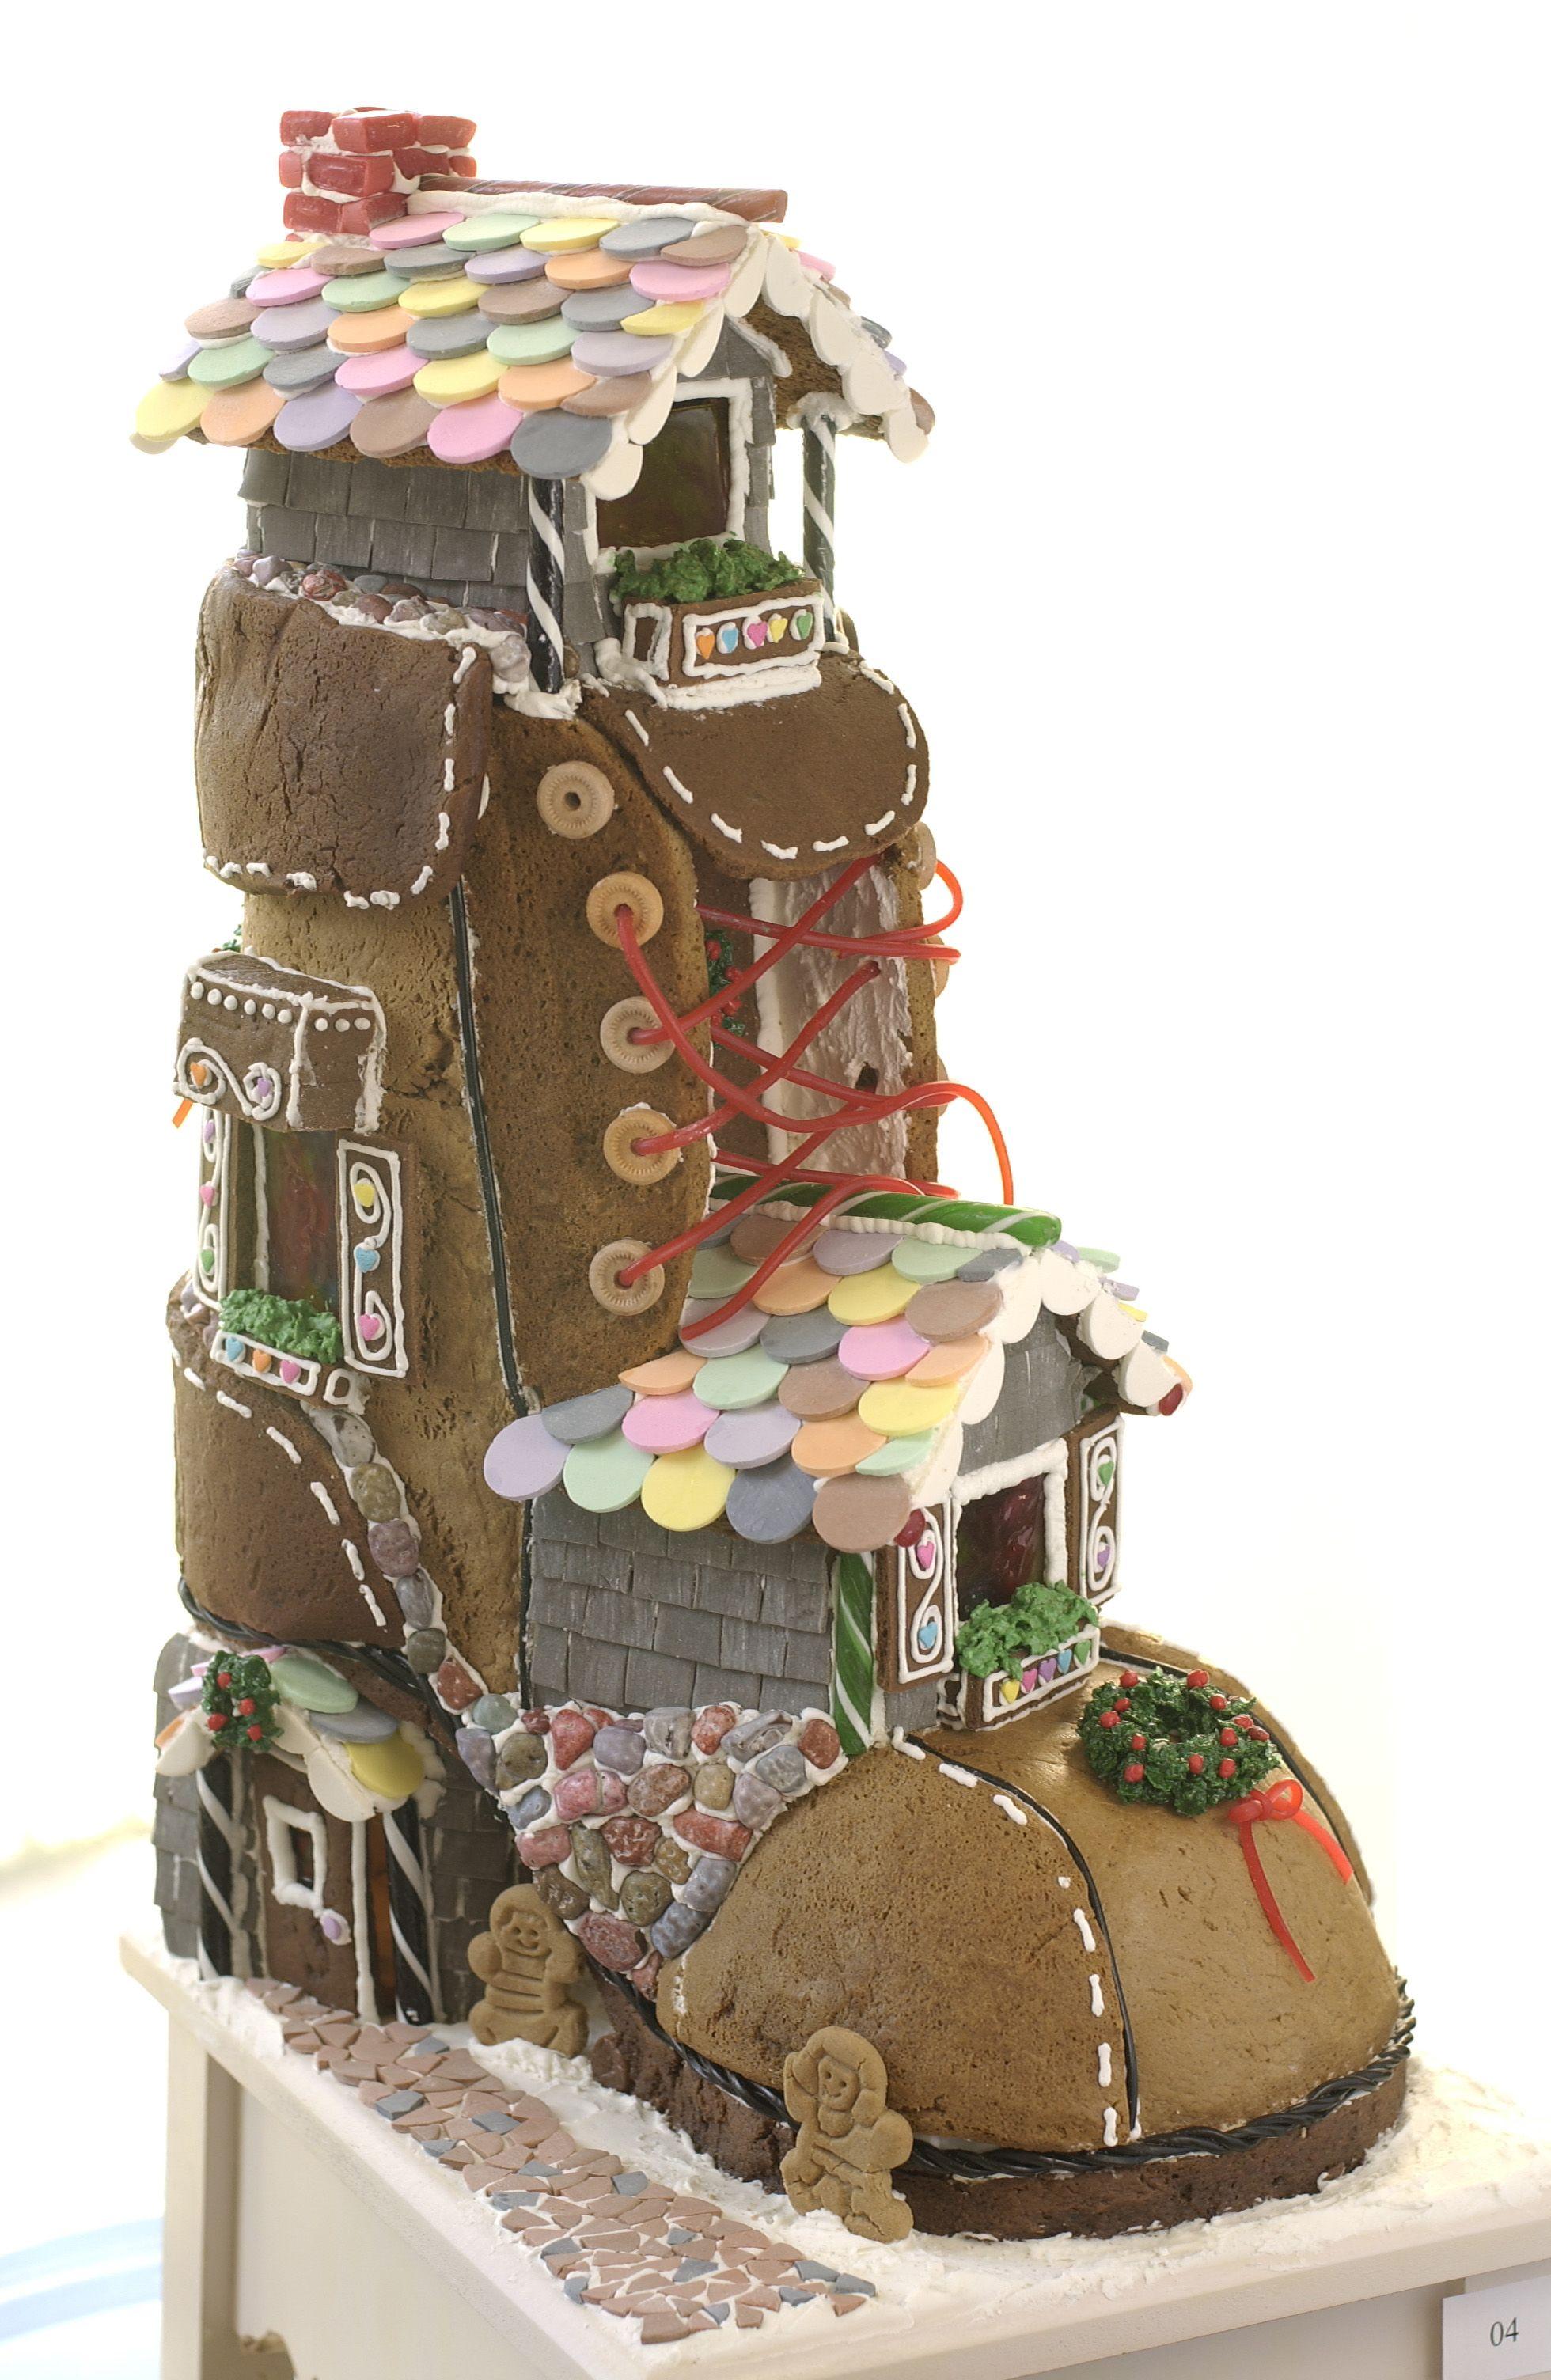 14 Incredible Gingerbread Houses Gingerbread houses